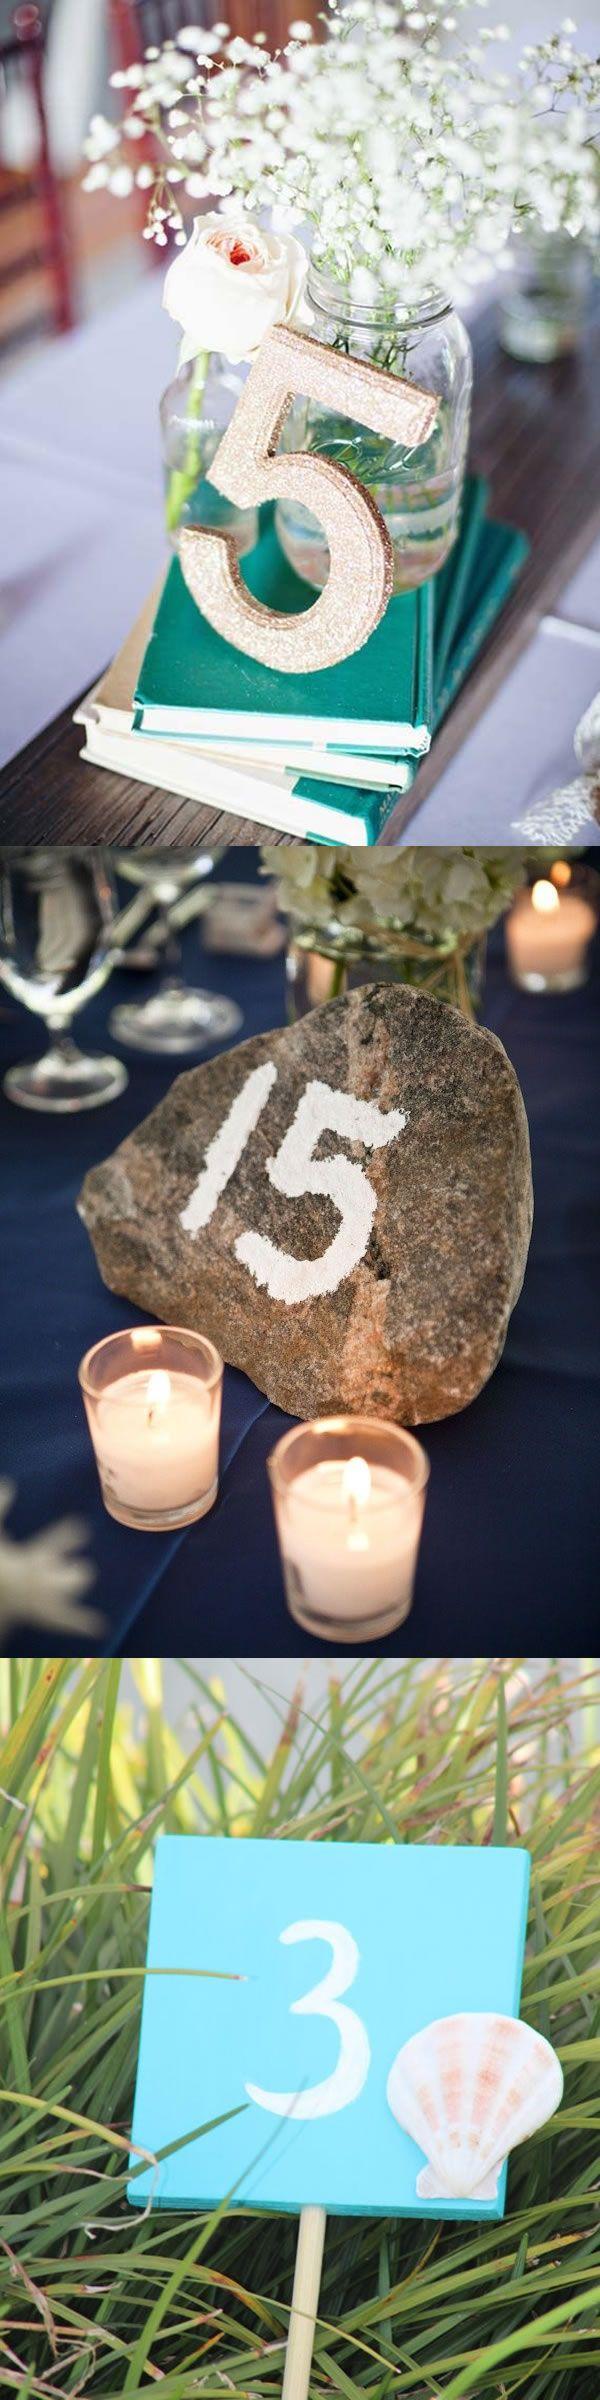 DIY Beach Wedding Table Numbers, Creative Beach Wedding Table Number Ideas,  Burlap, Stone